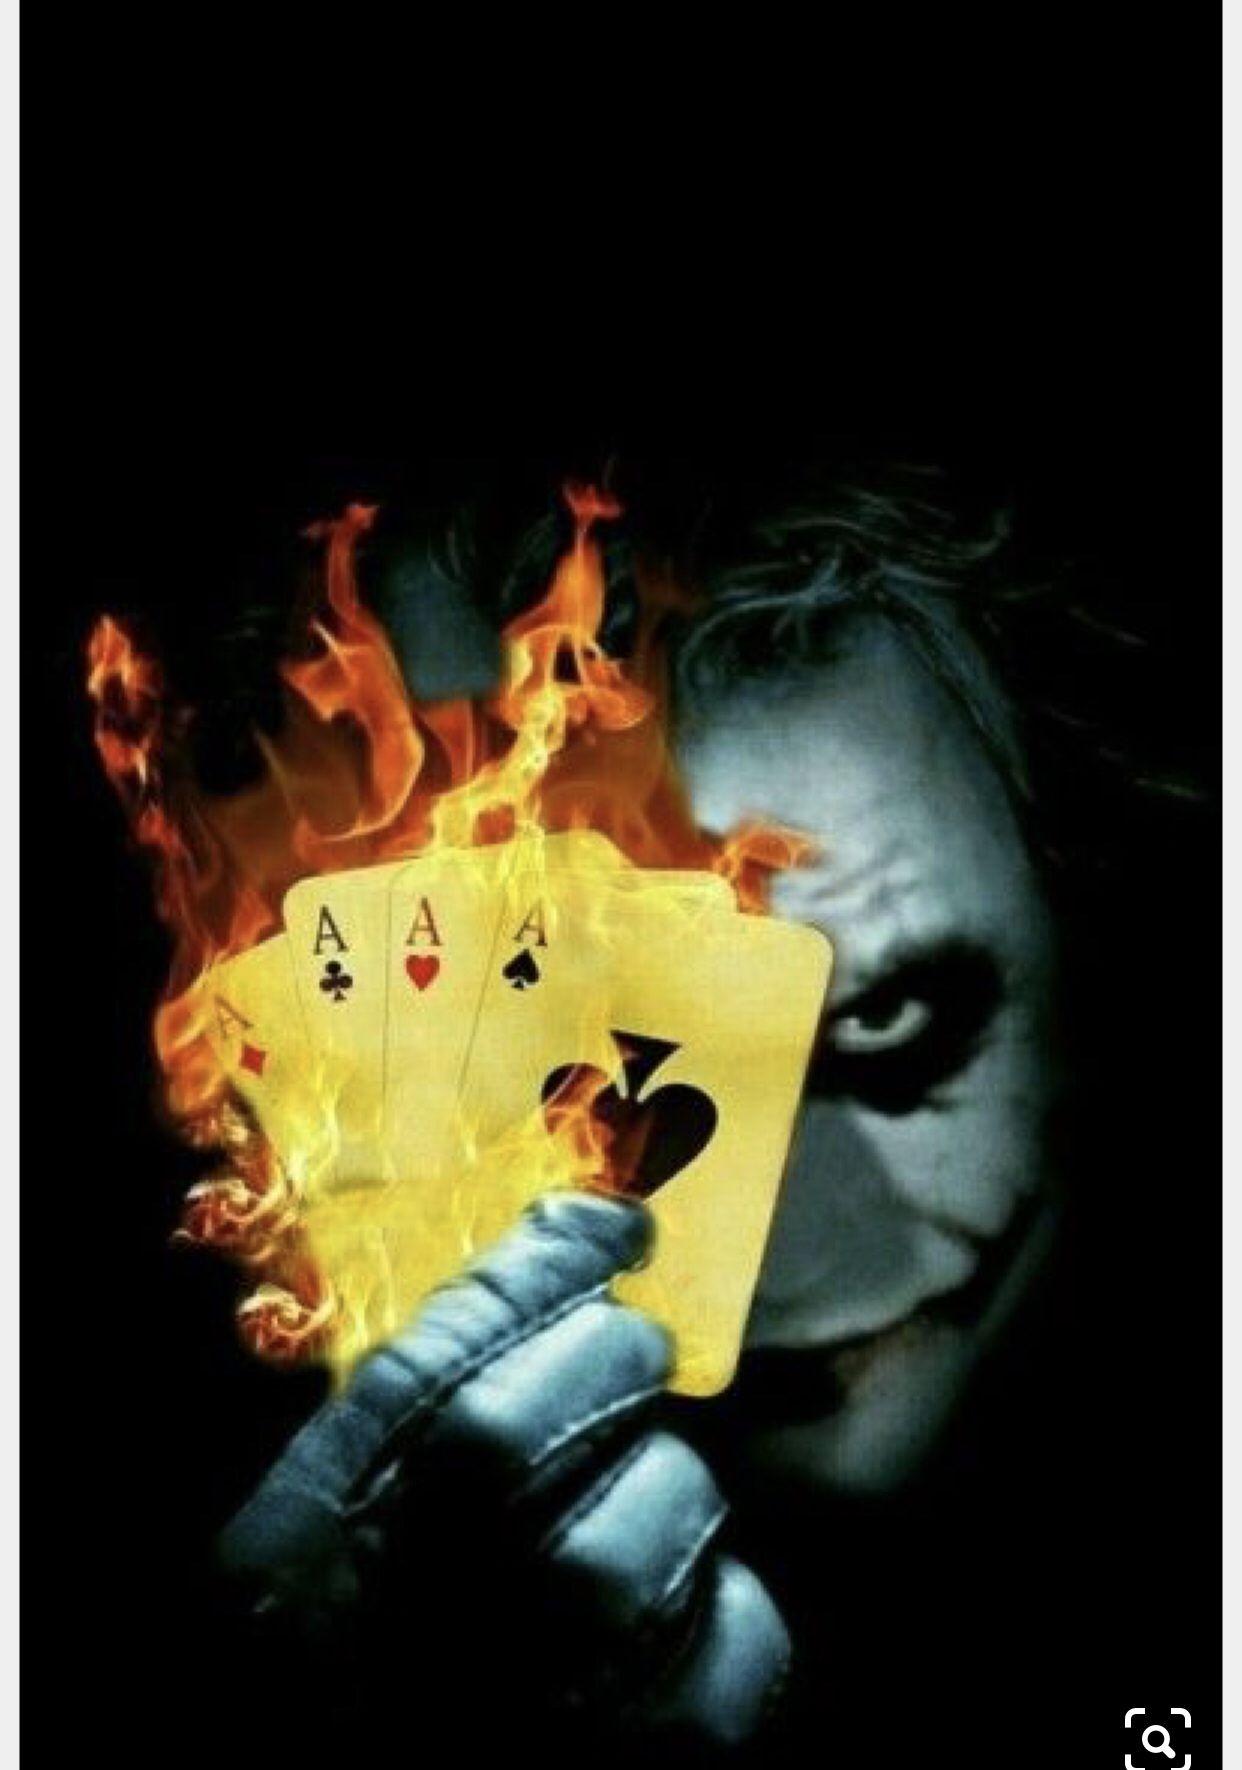 Pin By League Of Shadows Pb On Joker Joker Wallpapers Joker Hd Wallpaper Joker Wallpaper For Mobile